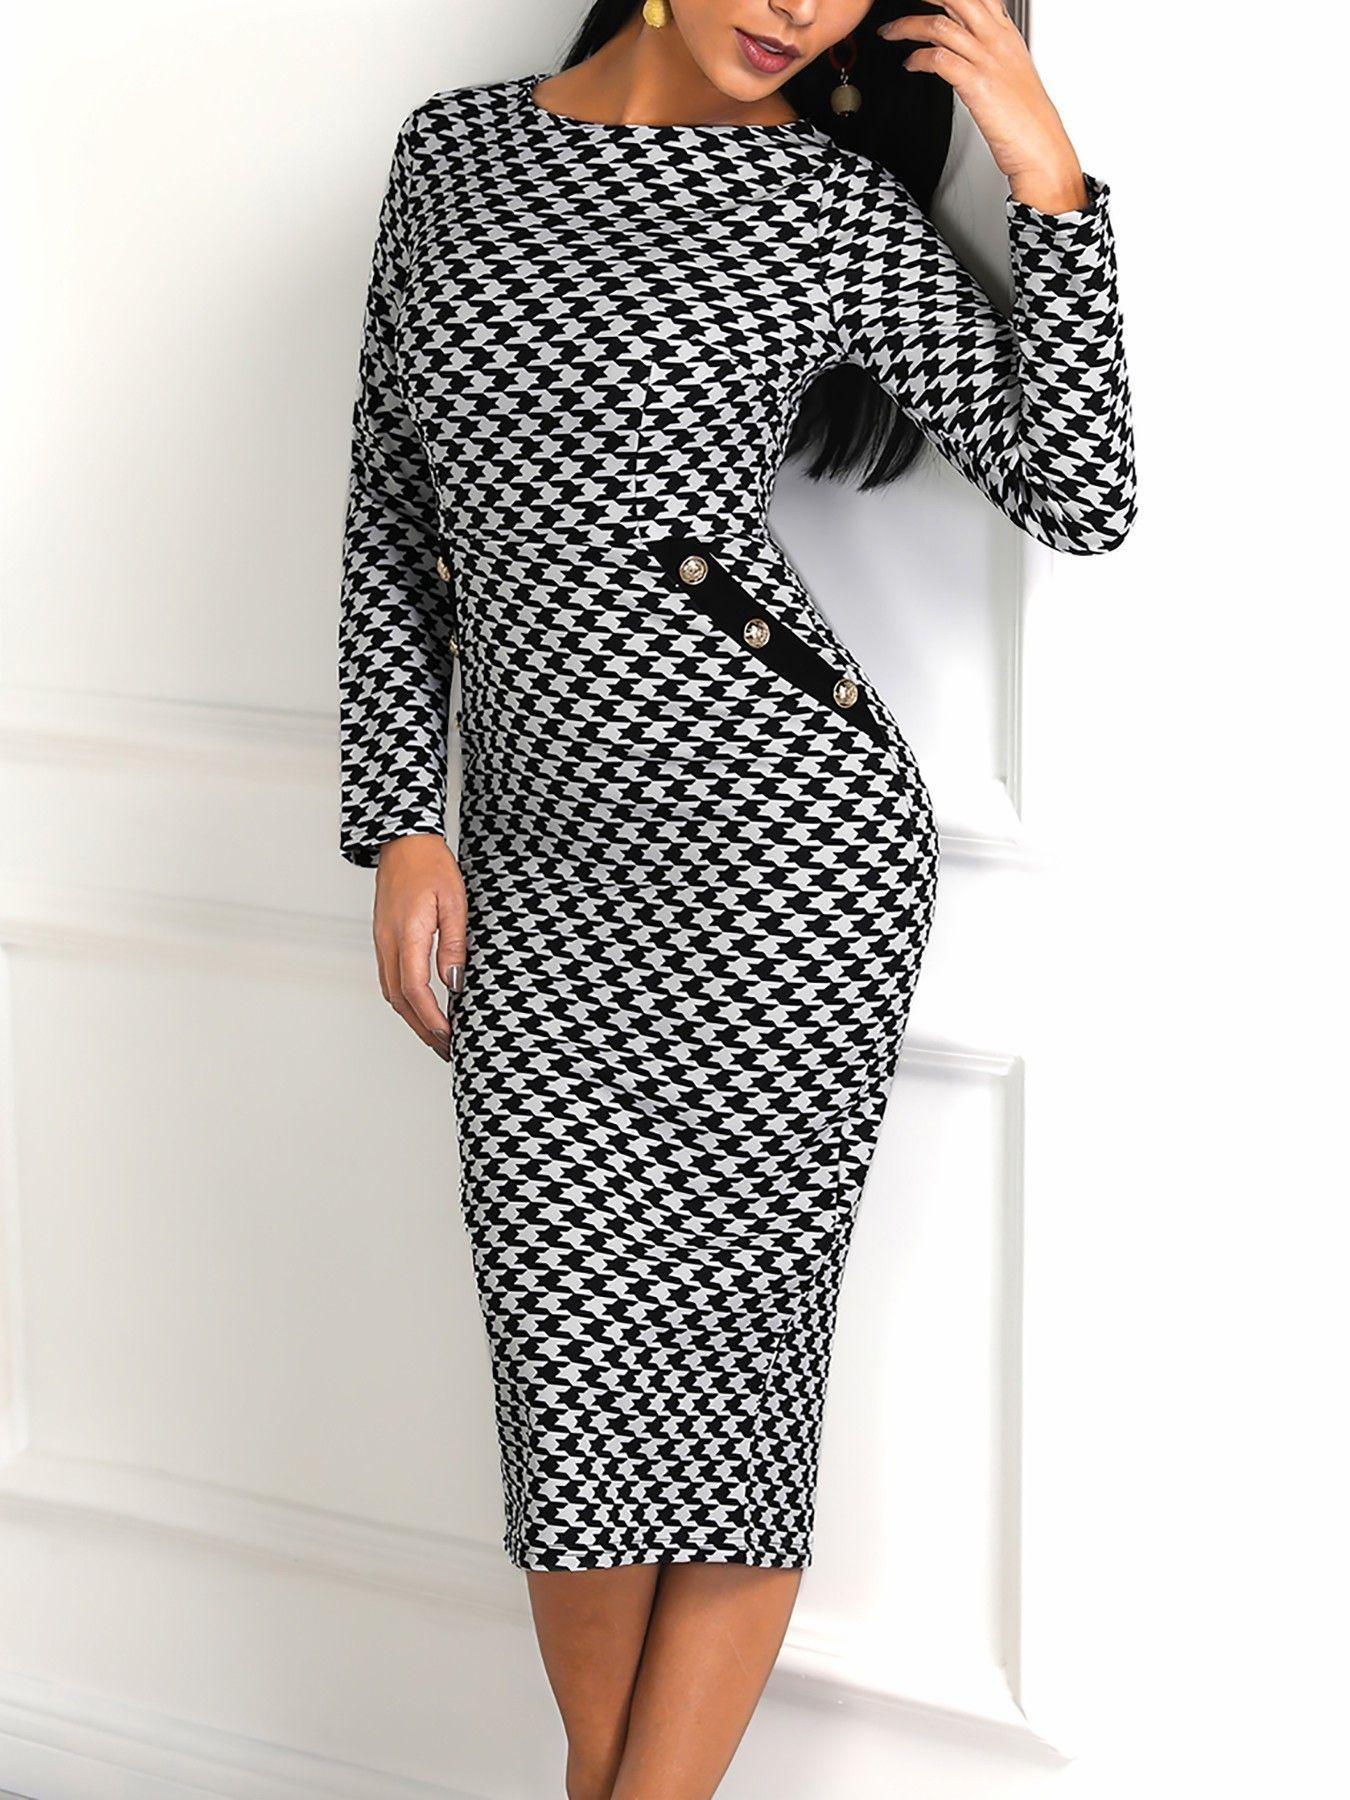 10229130e06 Houndstooth Print Long Sleeve Dress #fashion #beautiful #tops #style ...